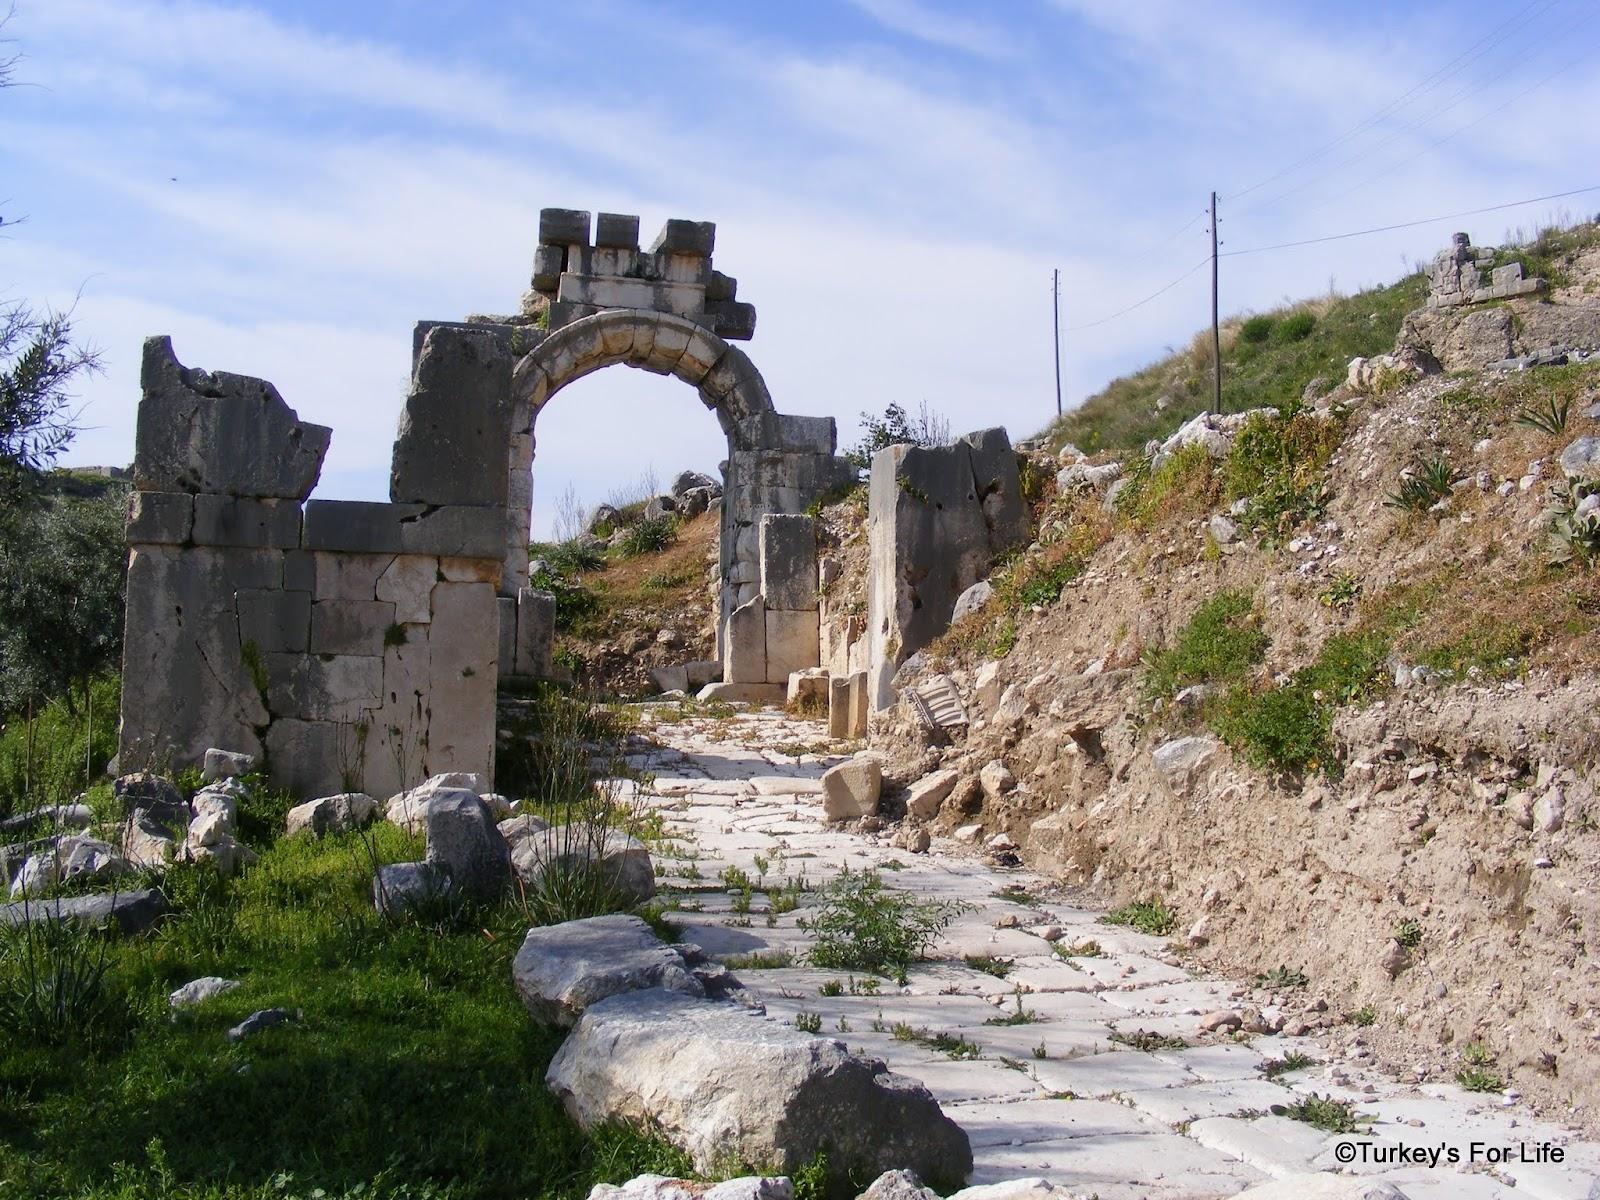 Trekking Near Fethiye - The Letoon To Xanthos Walk